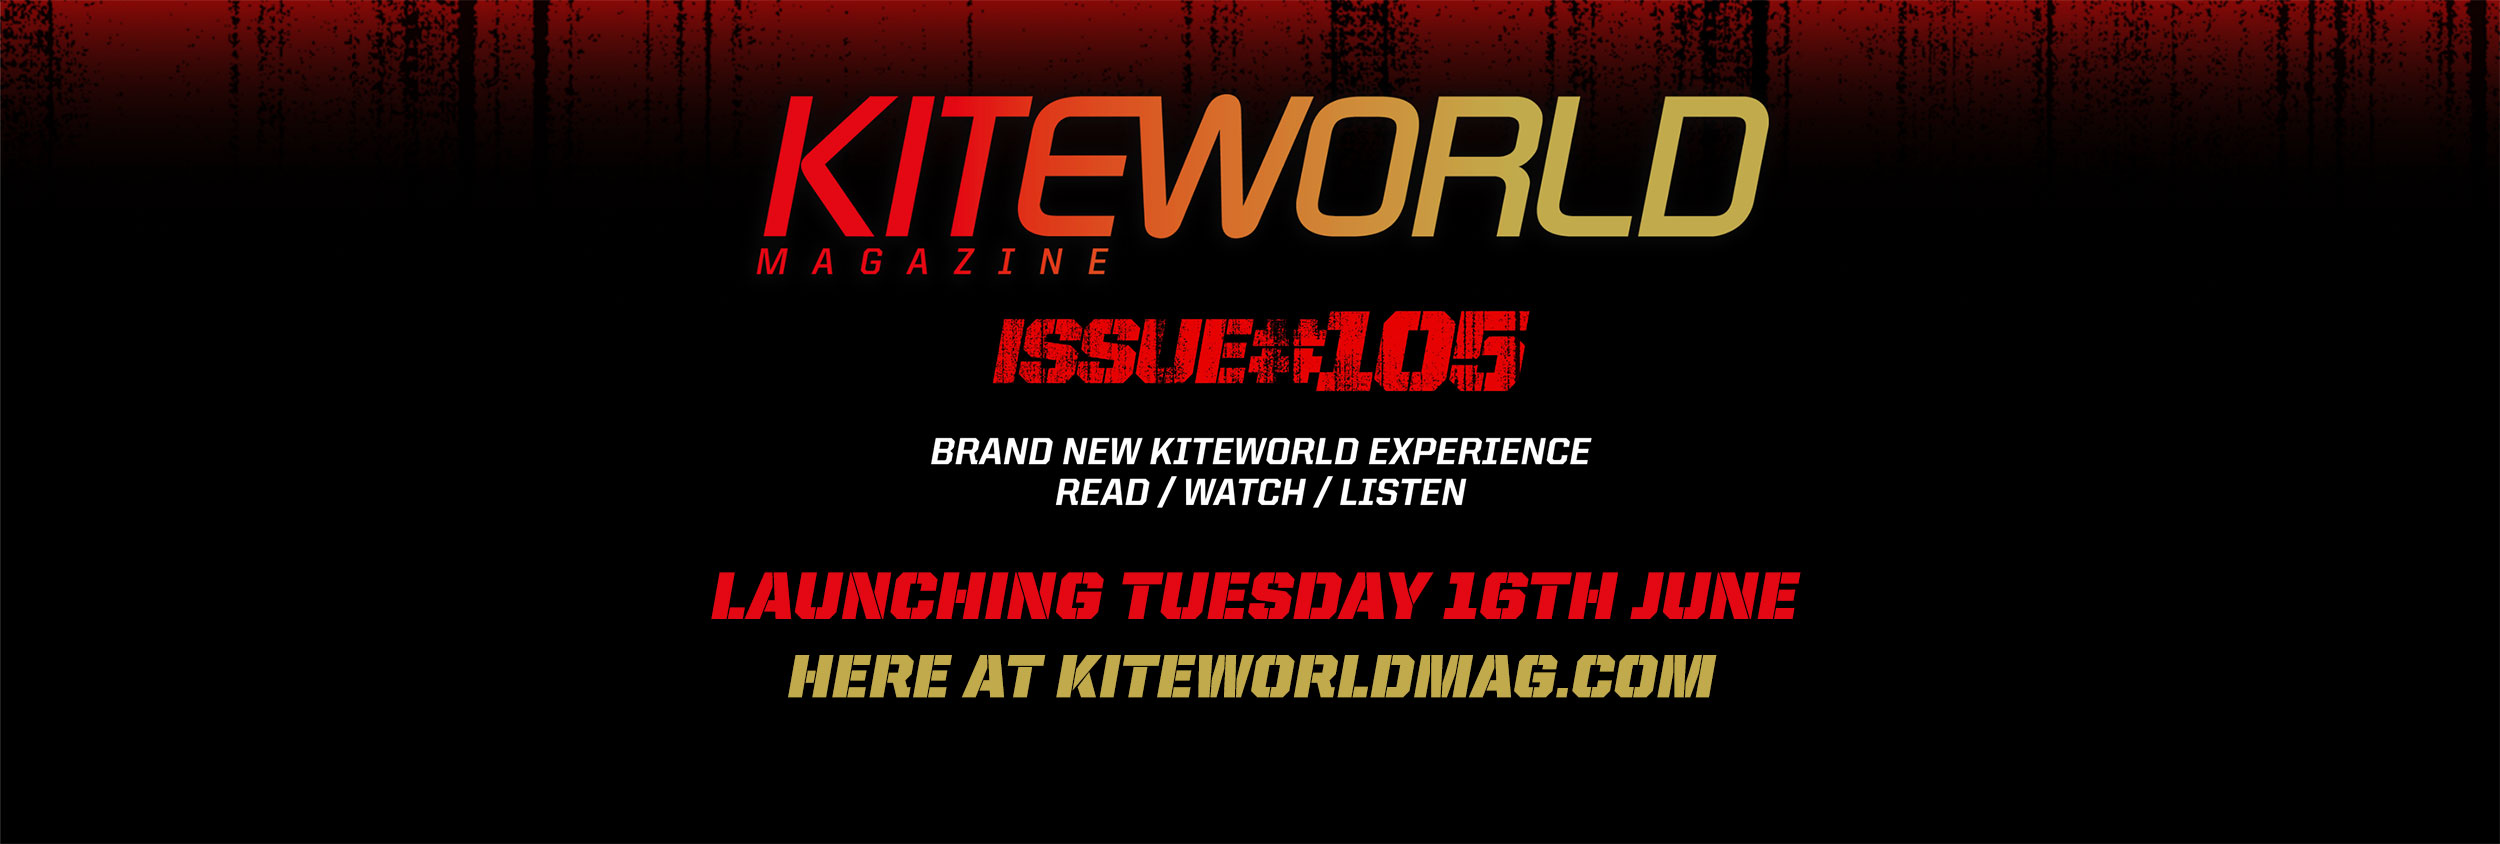 New Kiteworld digital magazine launch